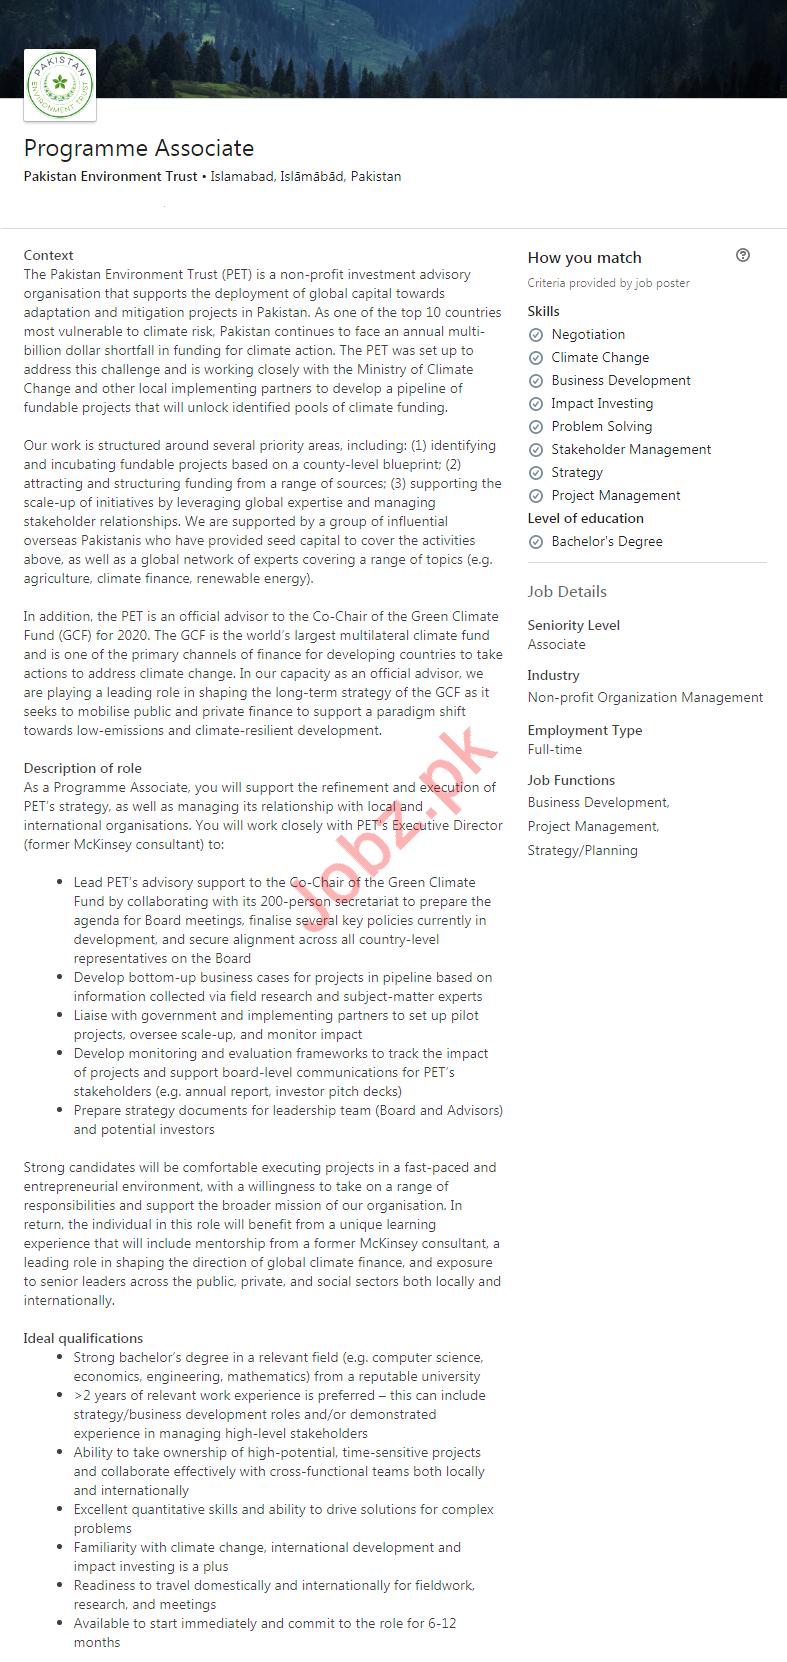 Programme Associate Jobs in Pakistan Environment Trust